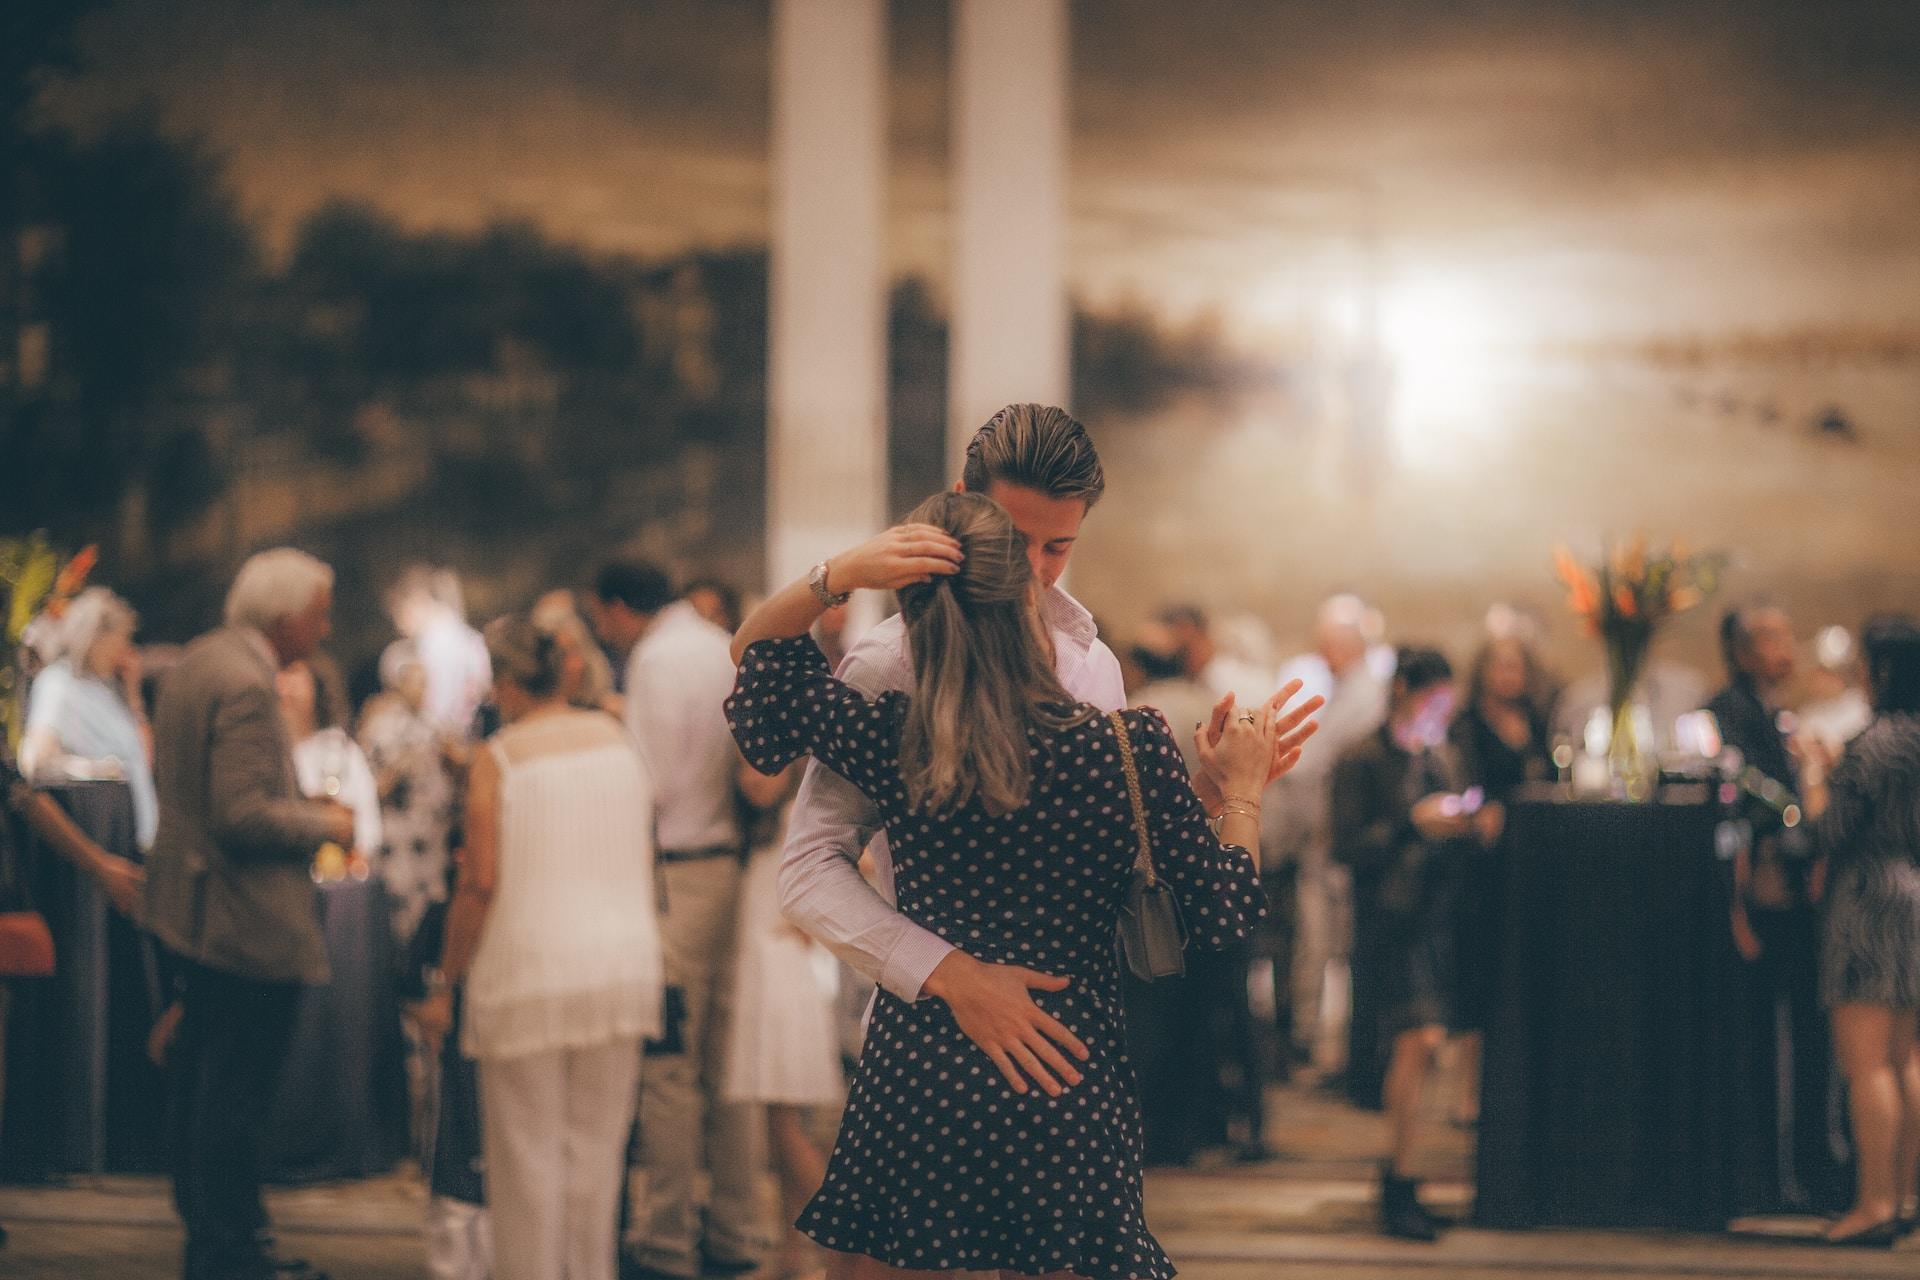 woman in polka-dot dress dancing with man in white dress shirt